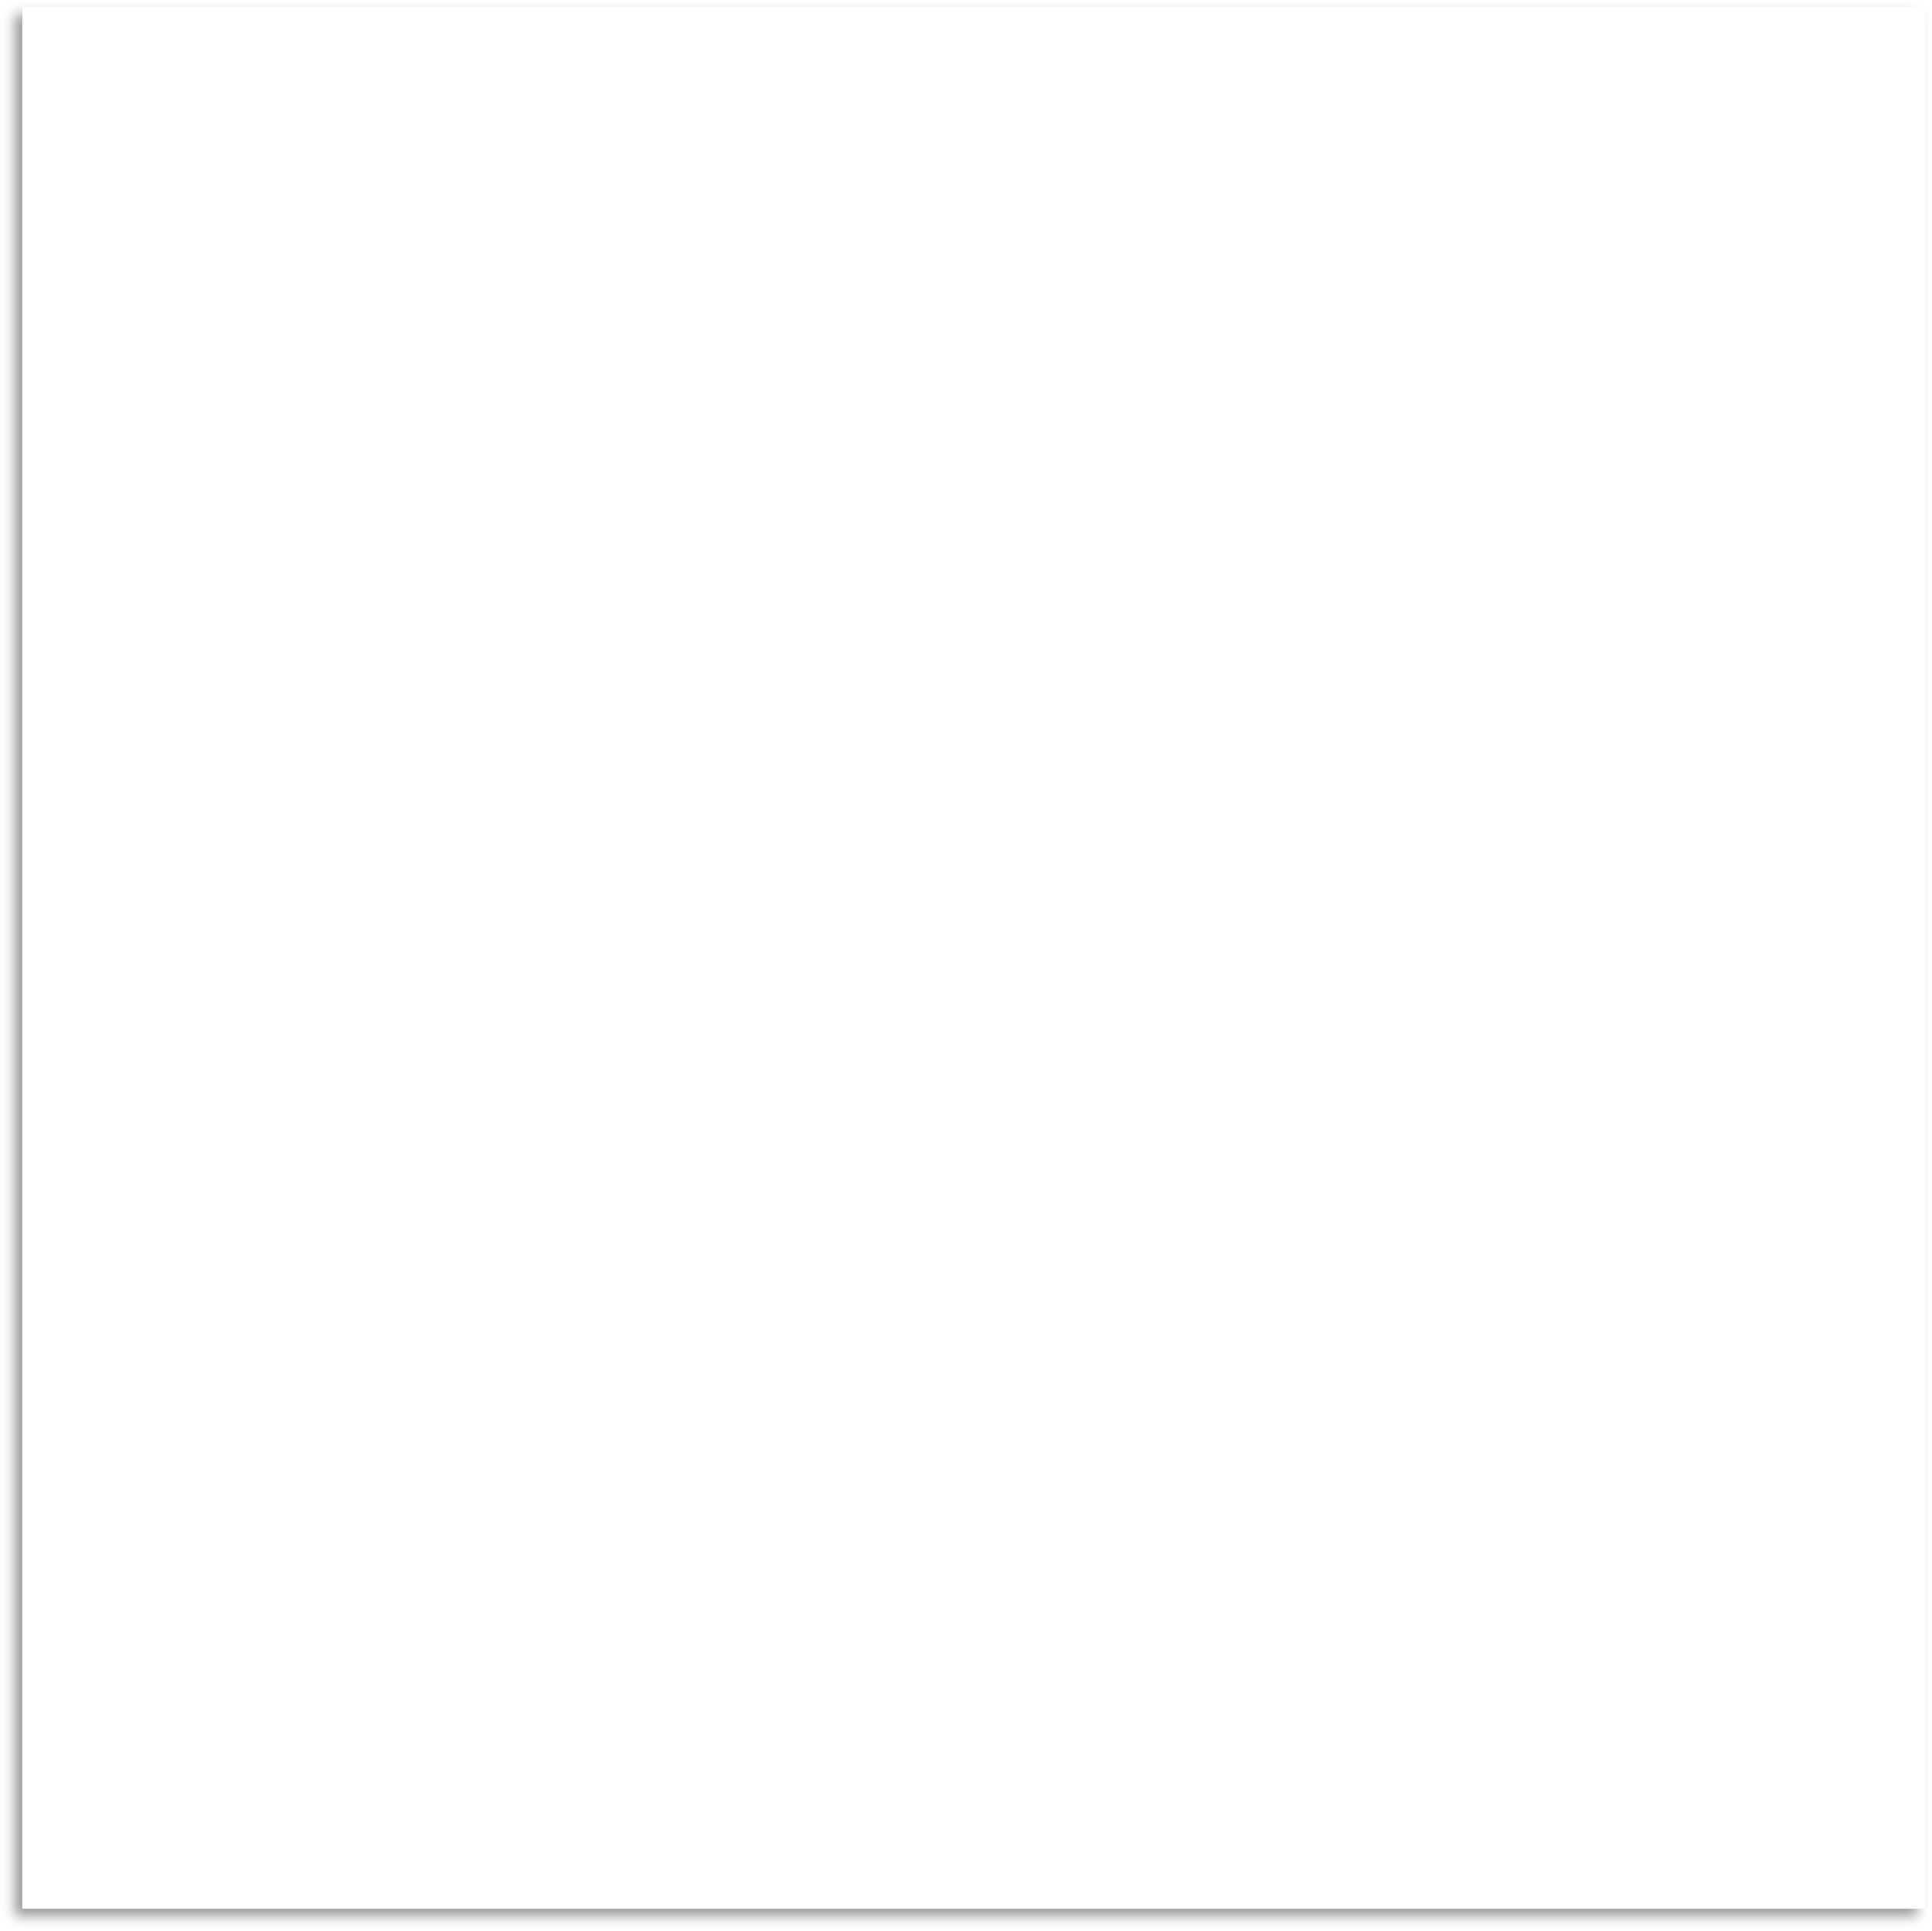 Mantel BLANCO Rectangular 1,5x2,1m [retirooenvíoen 5·7díashábiles]